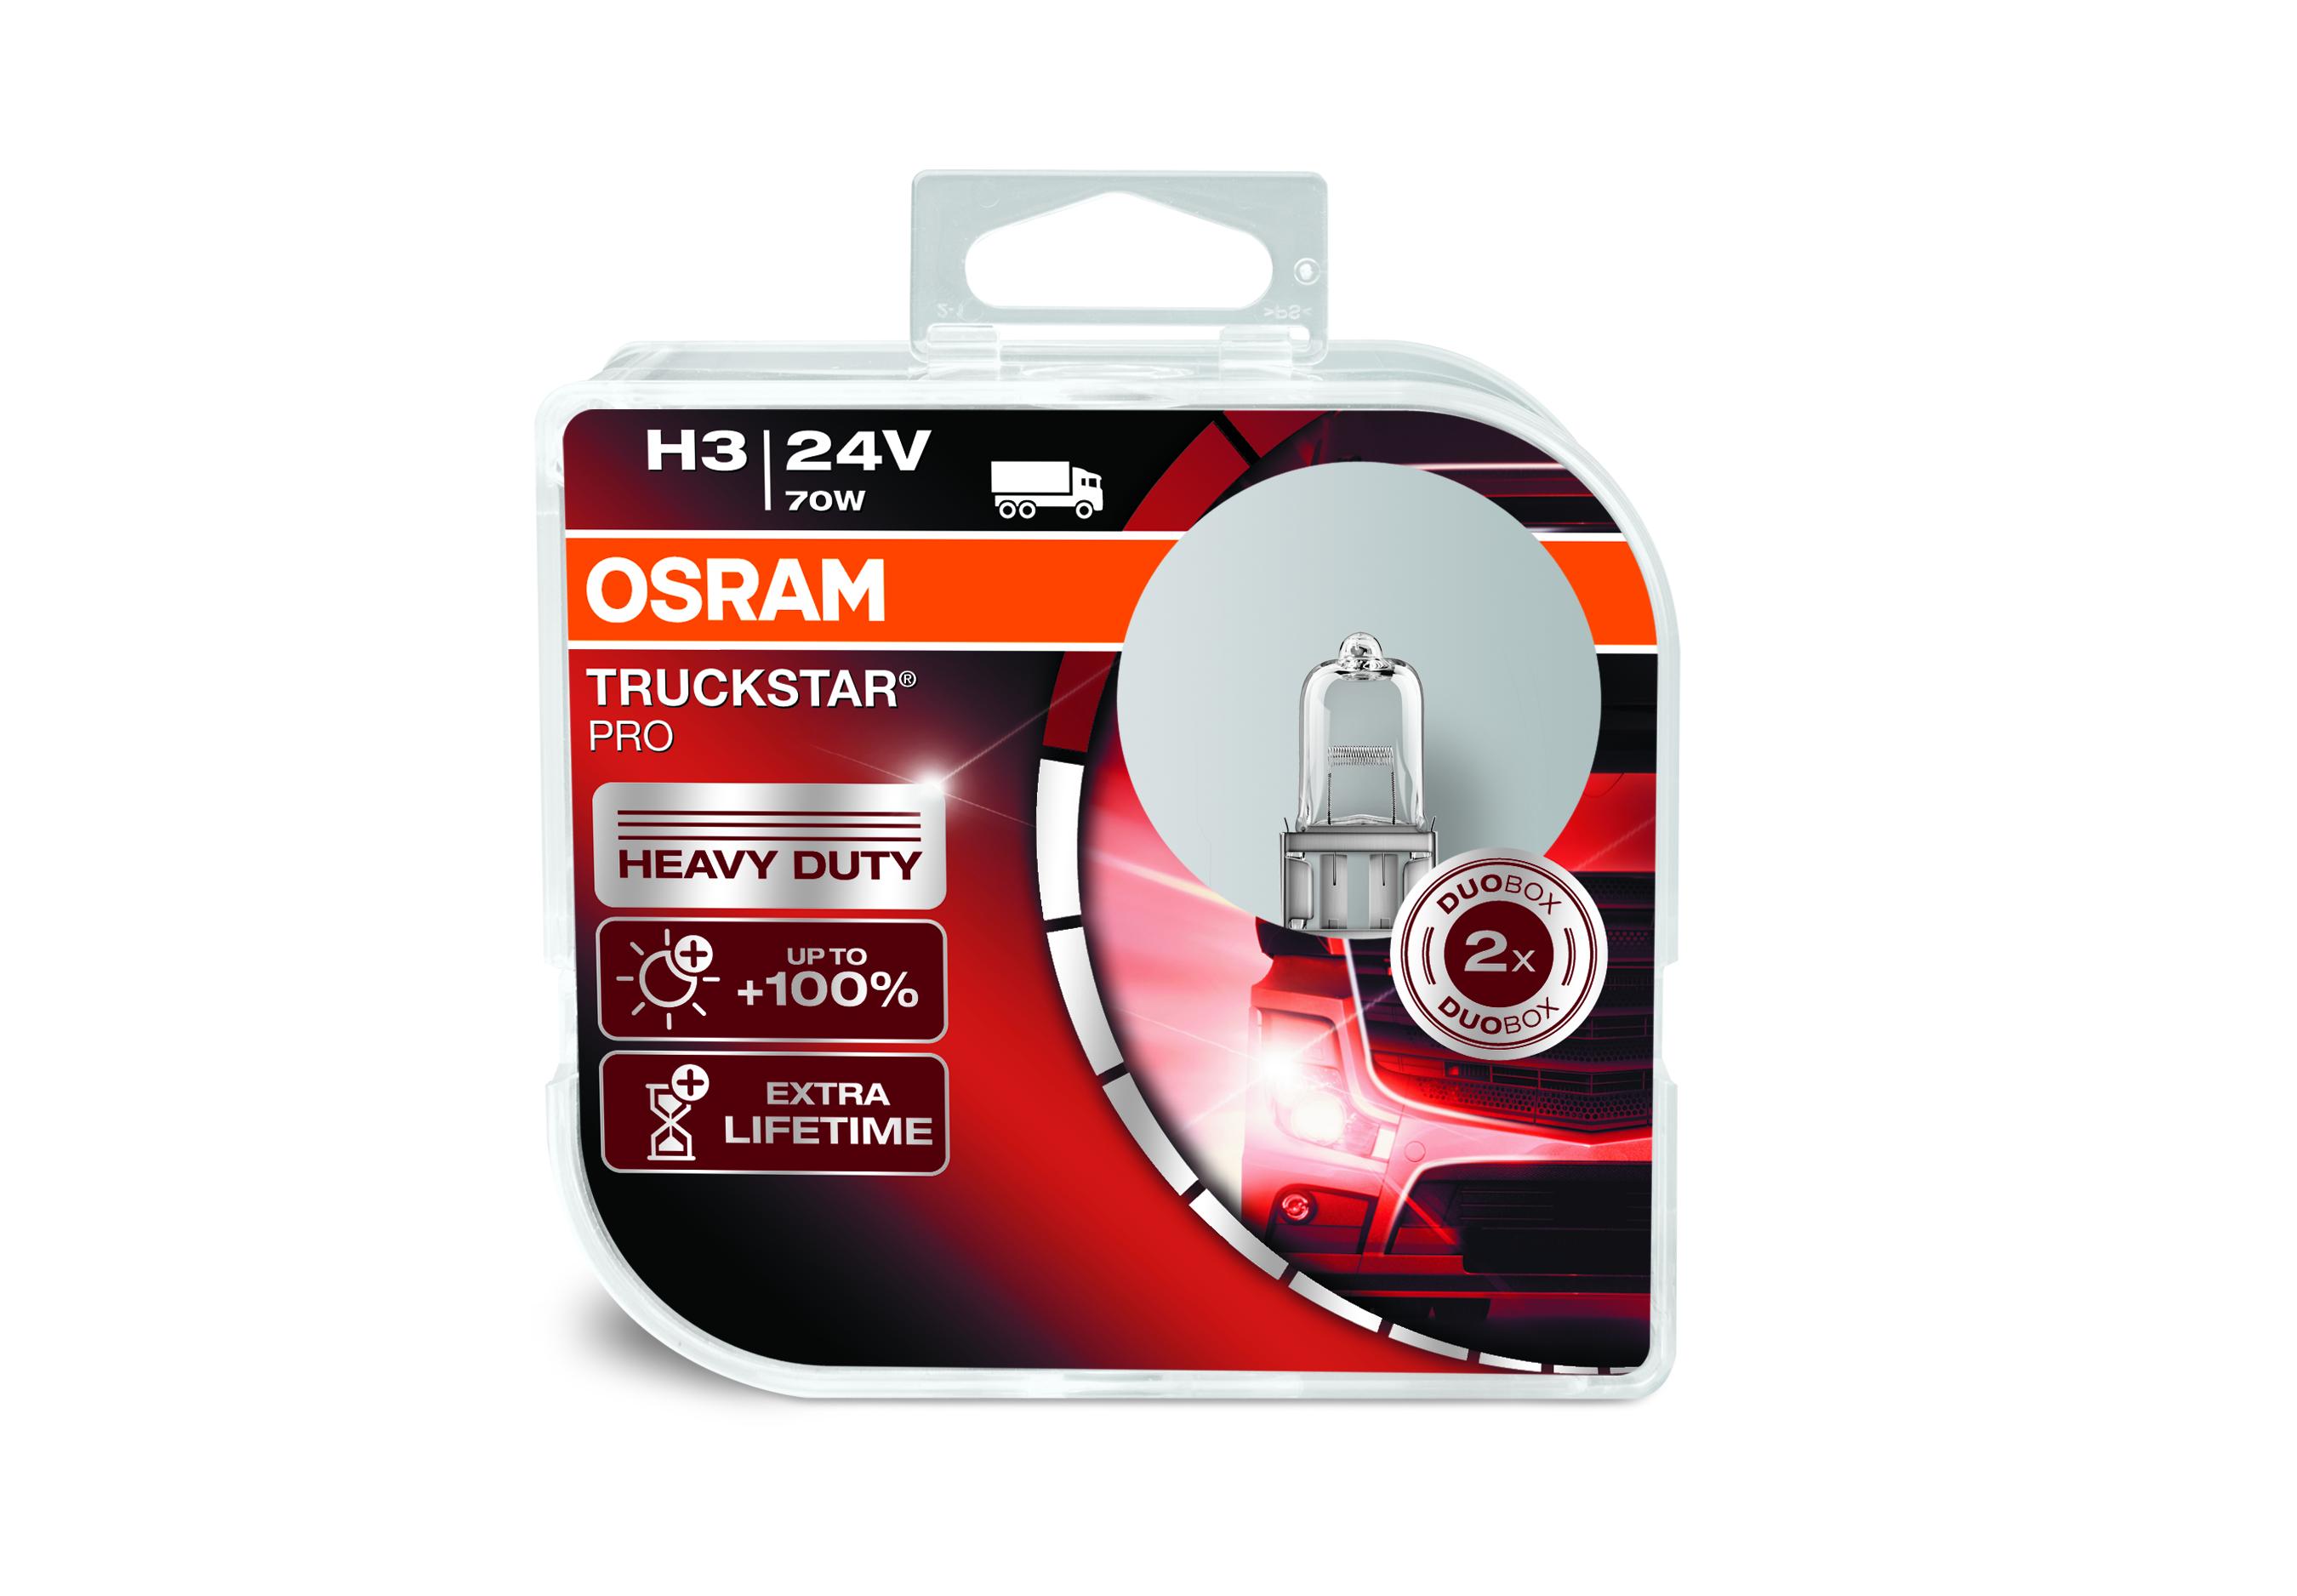 Osram halogenová žárovka, TRUCKSTAR PRO, H3, PK22s, 24V, 70W, 64156TSP-HCB